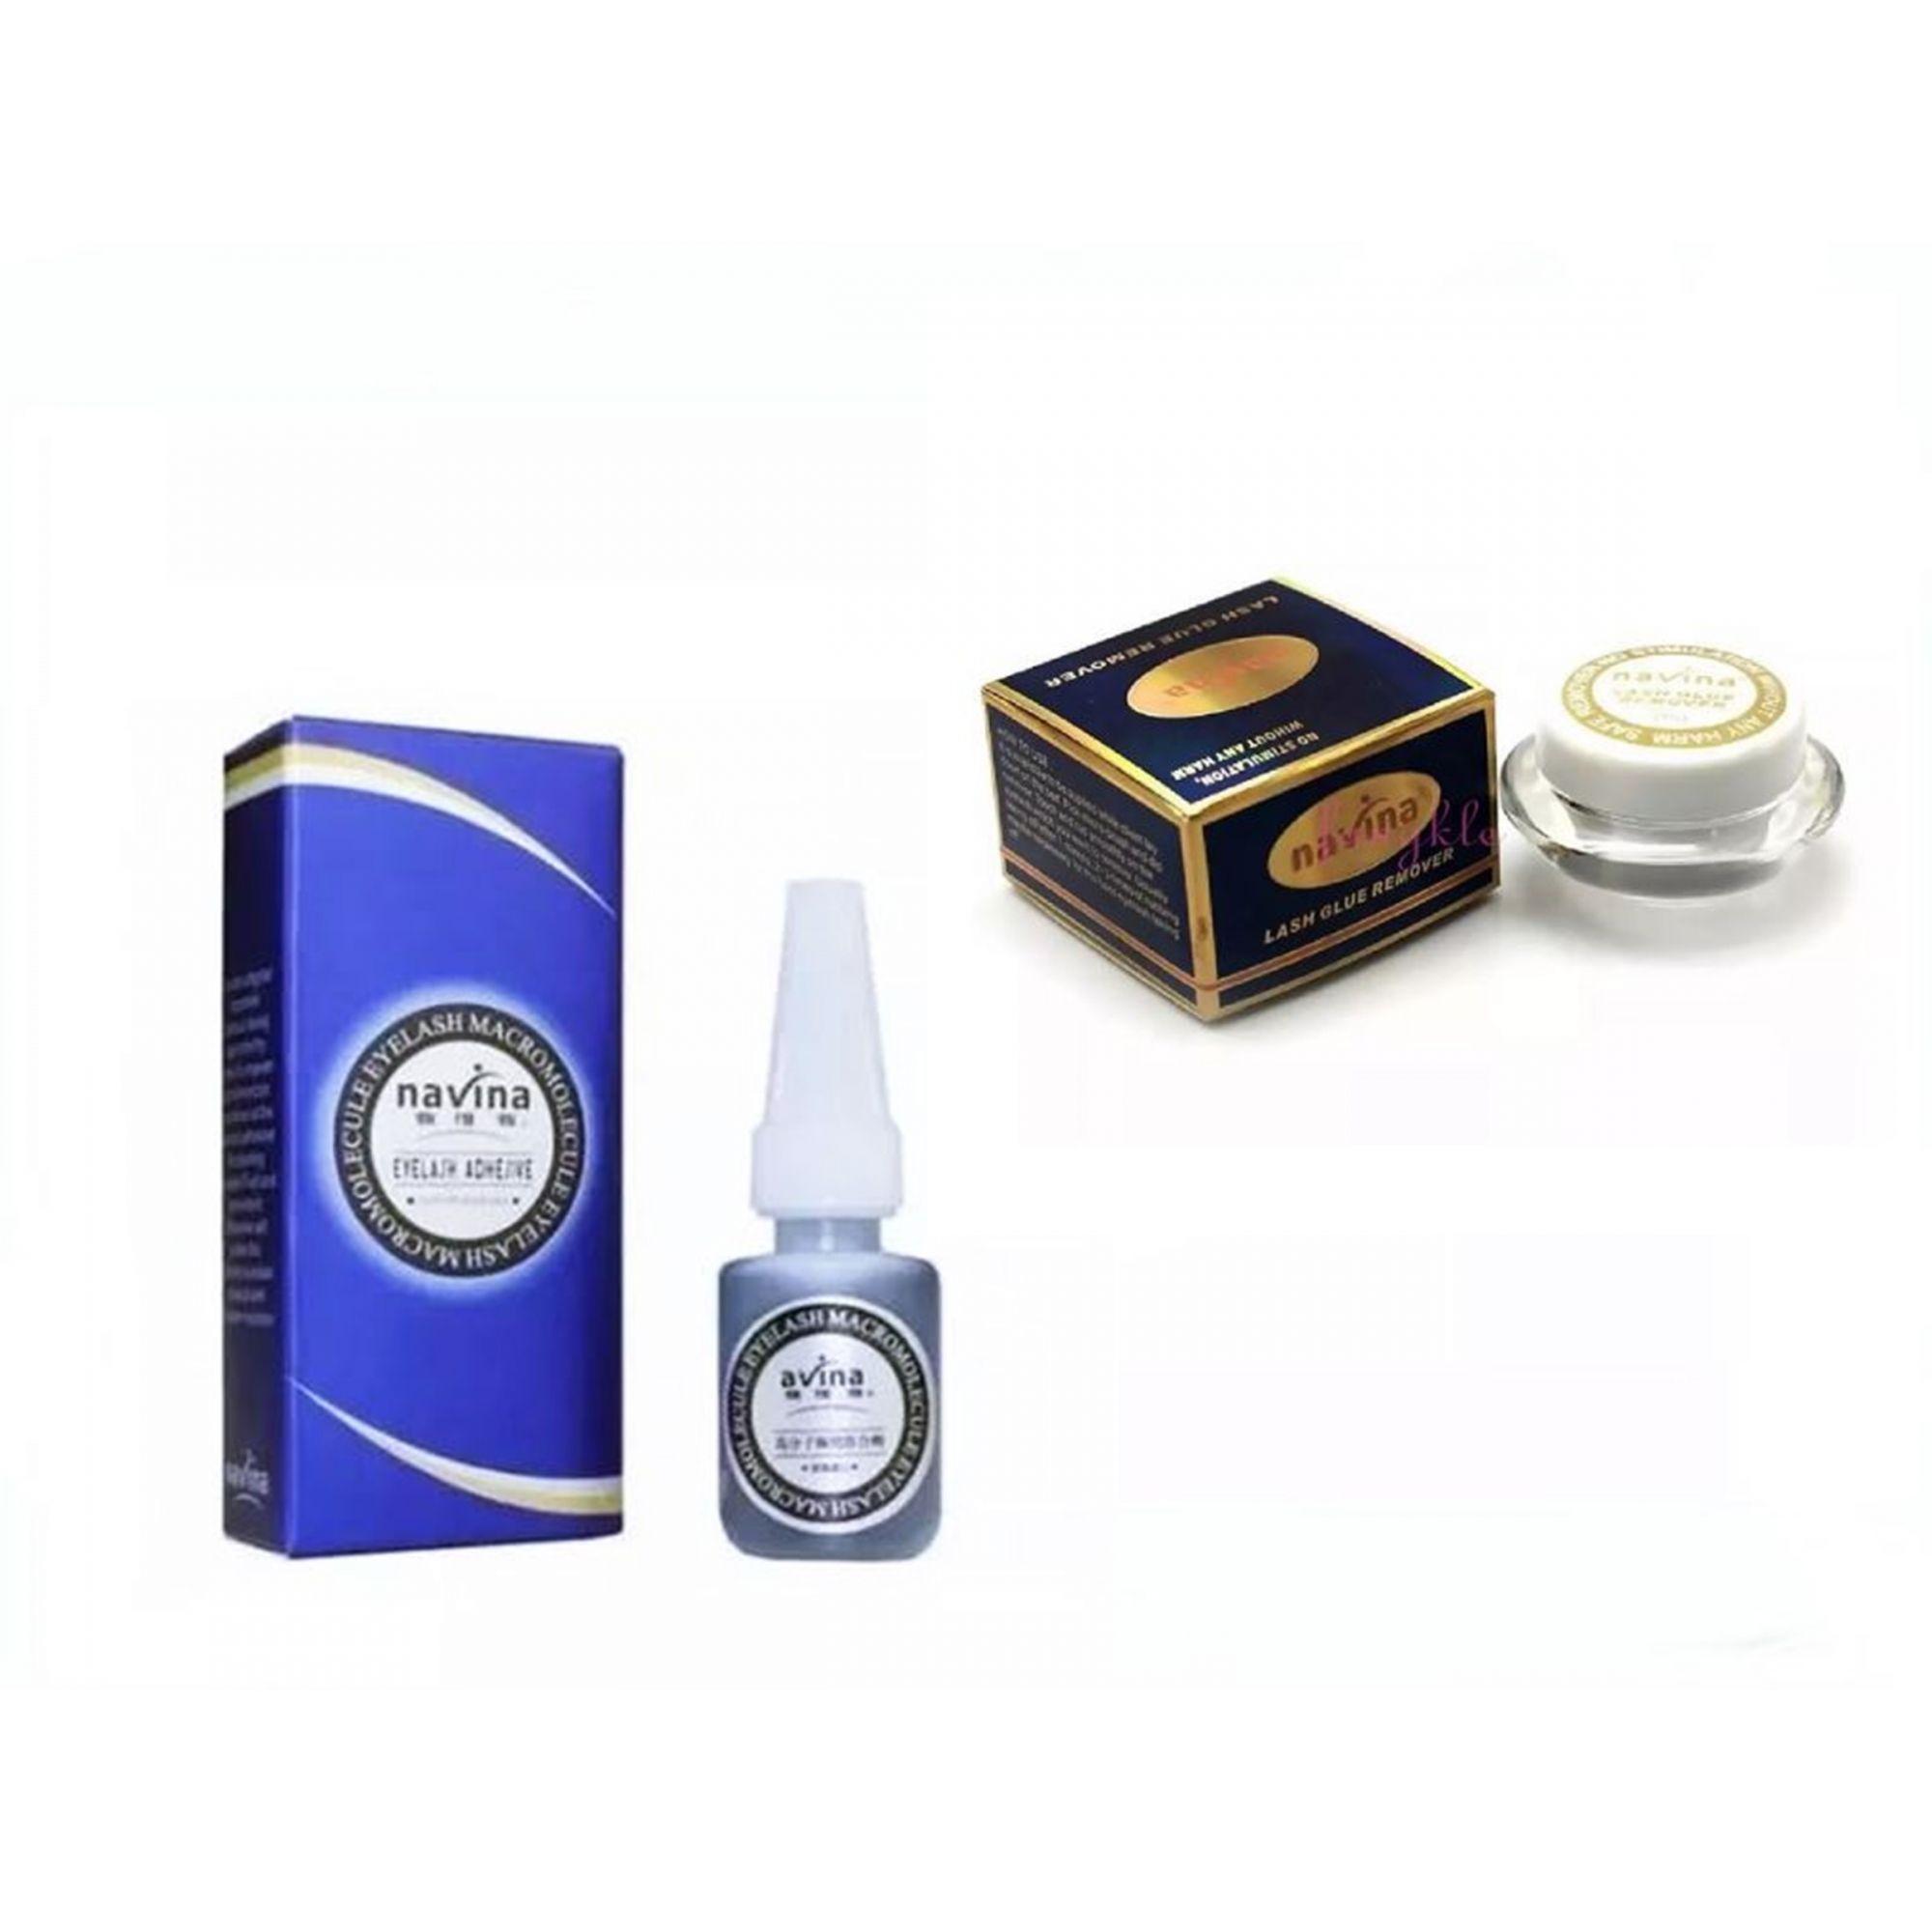 Cola Alongamento De Cílios Navina Azul + Removedor De Cílios Navina